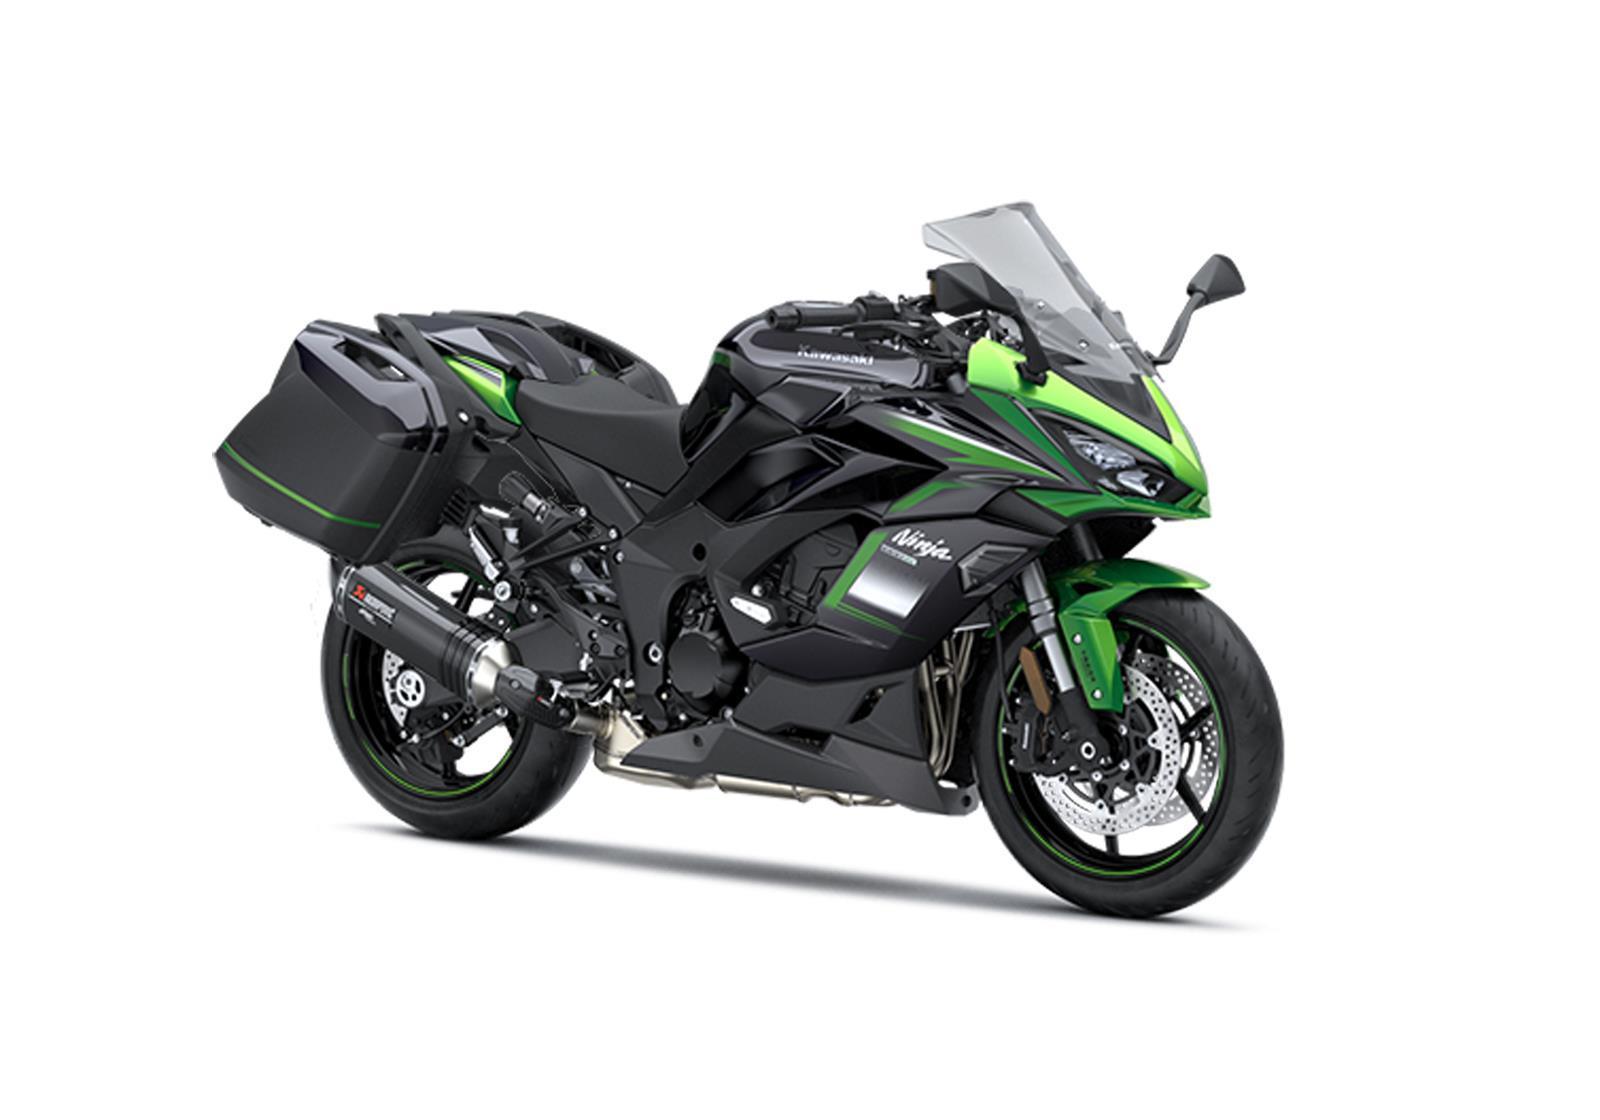 2021 Ninja 1000SX  Performance Tourer